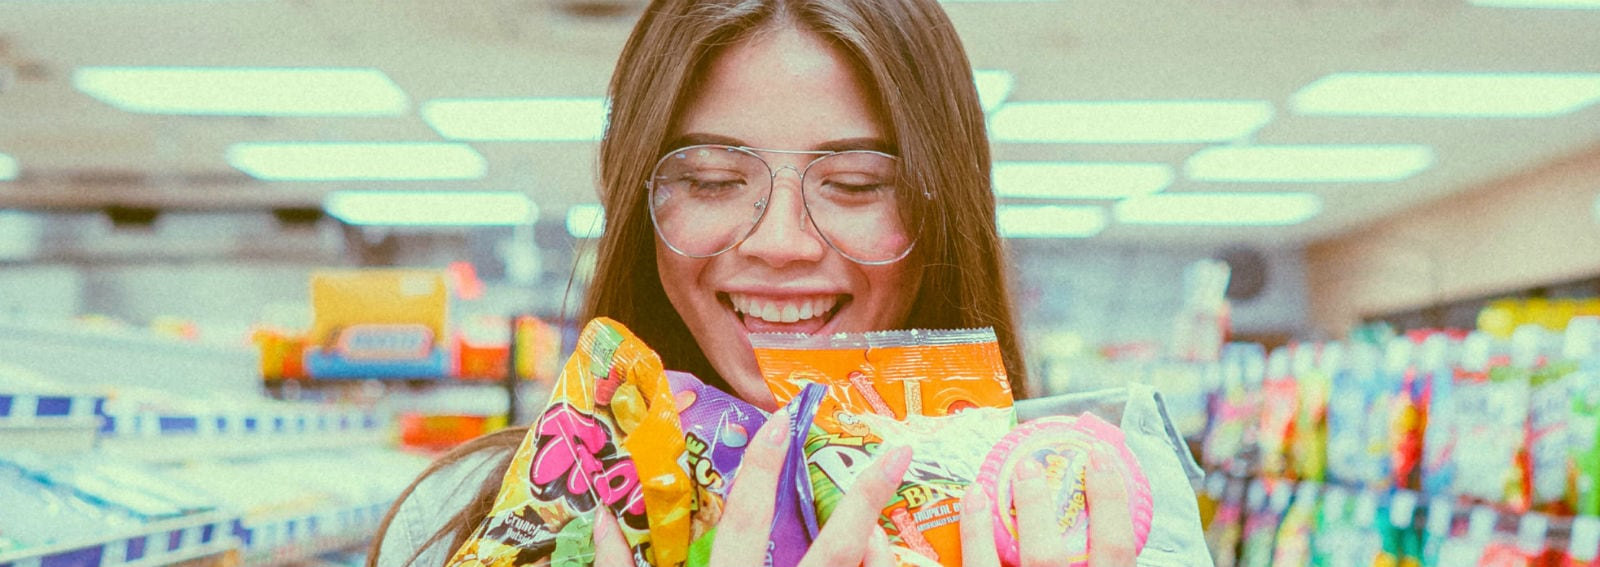 supermercato donna